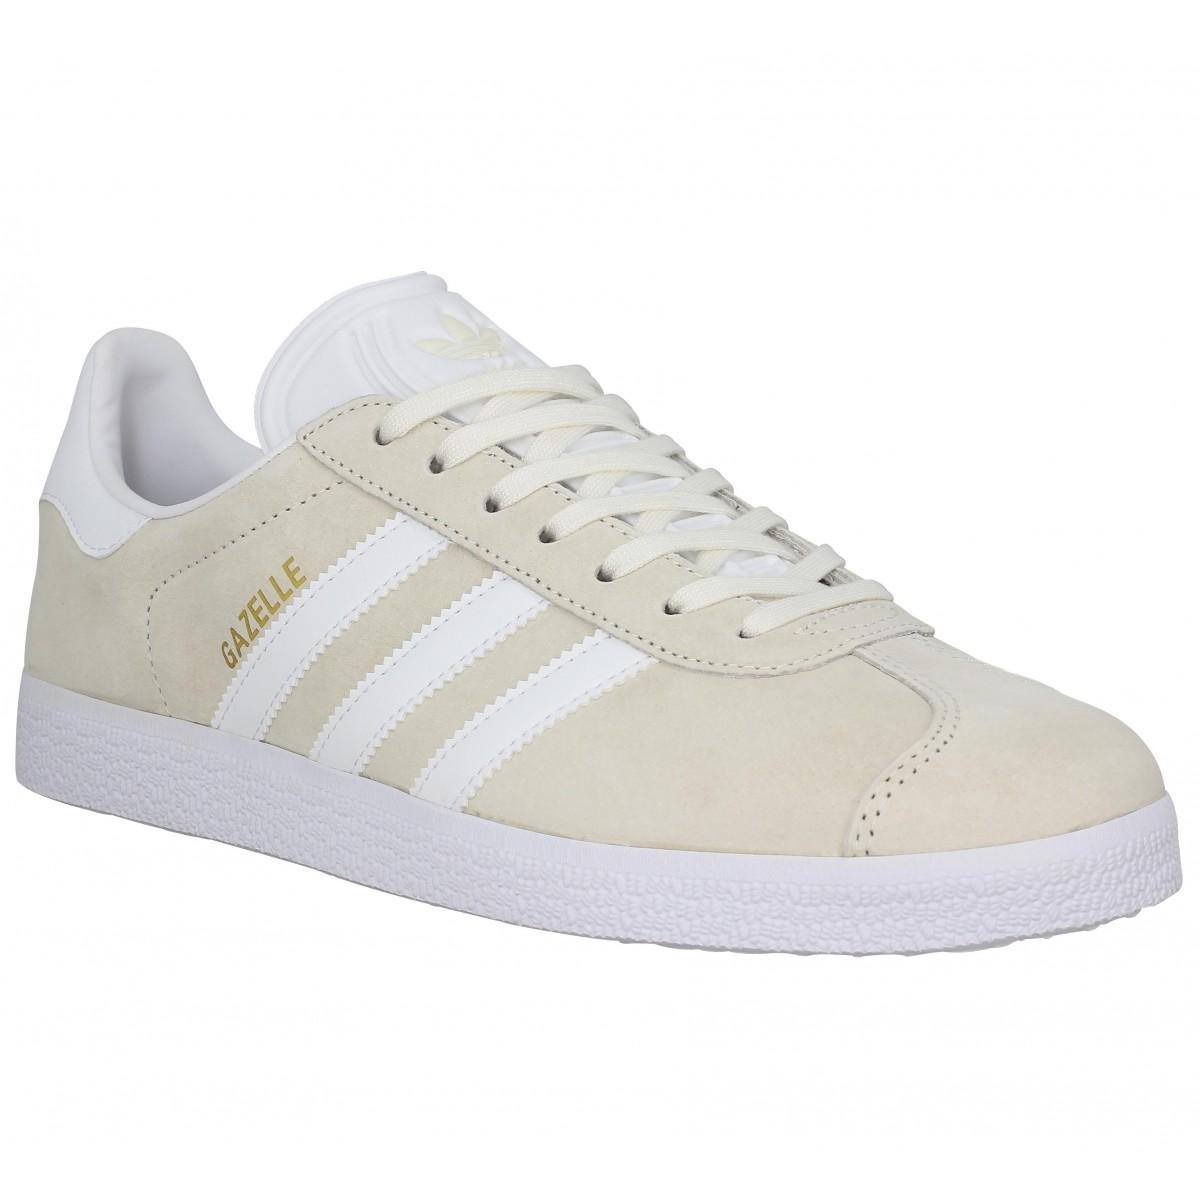 Adidas Marque Gazelle Velours...